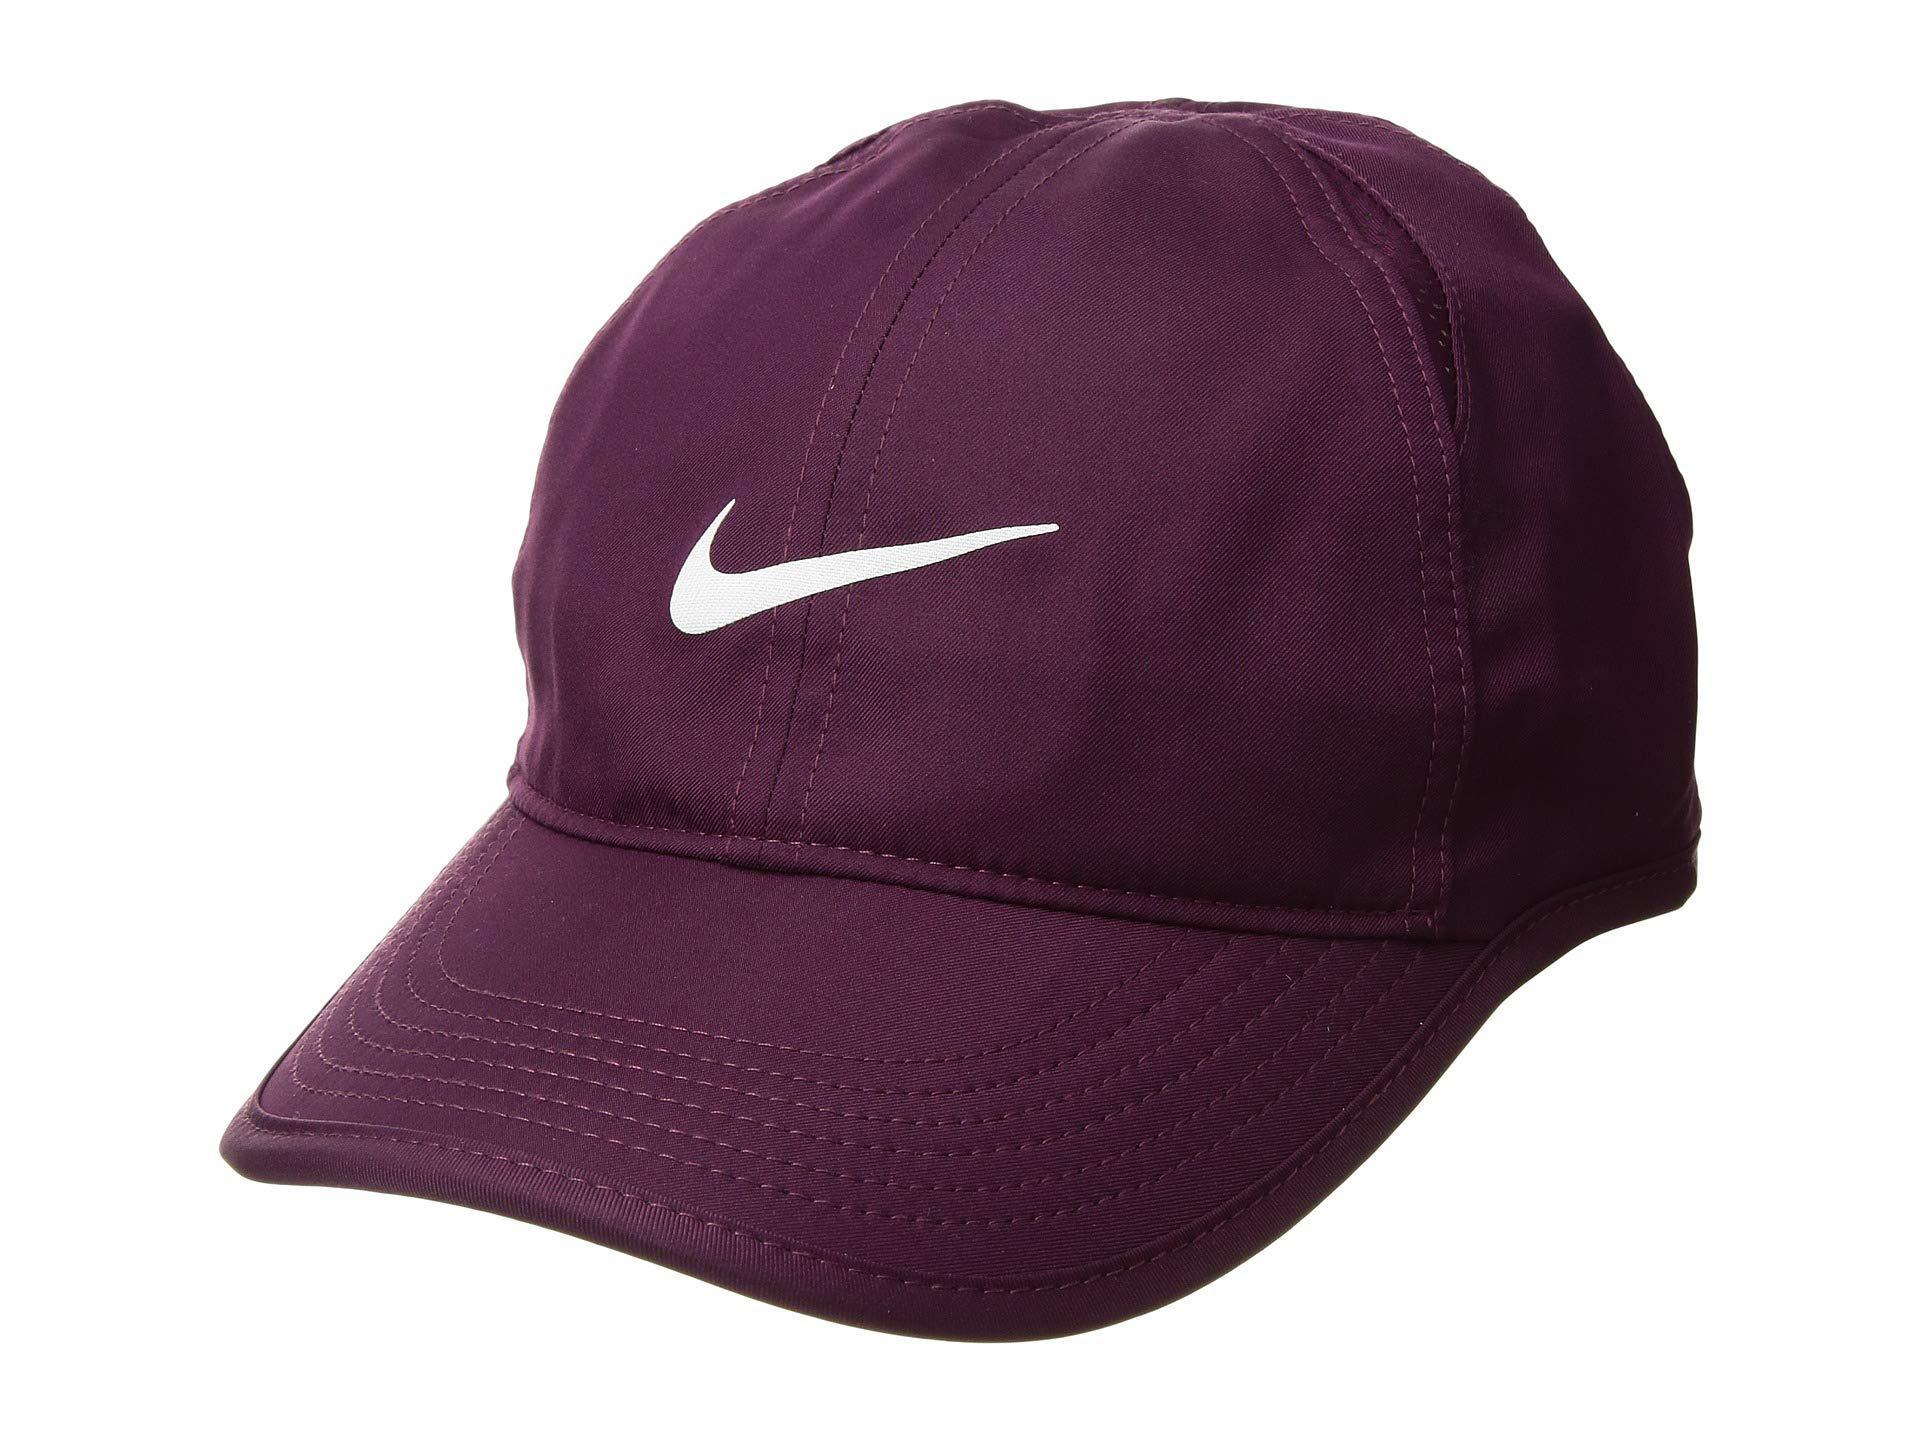 Lyst - Nike Featherlight Cap - Women s (atmosphere Grey black white ... cab051569